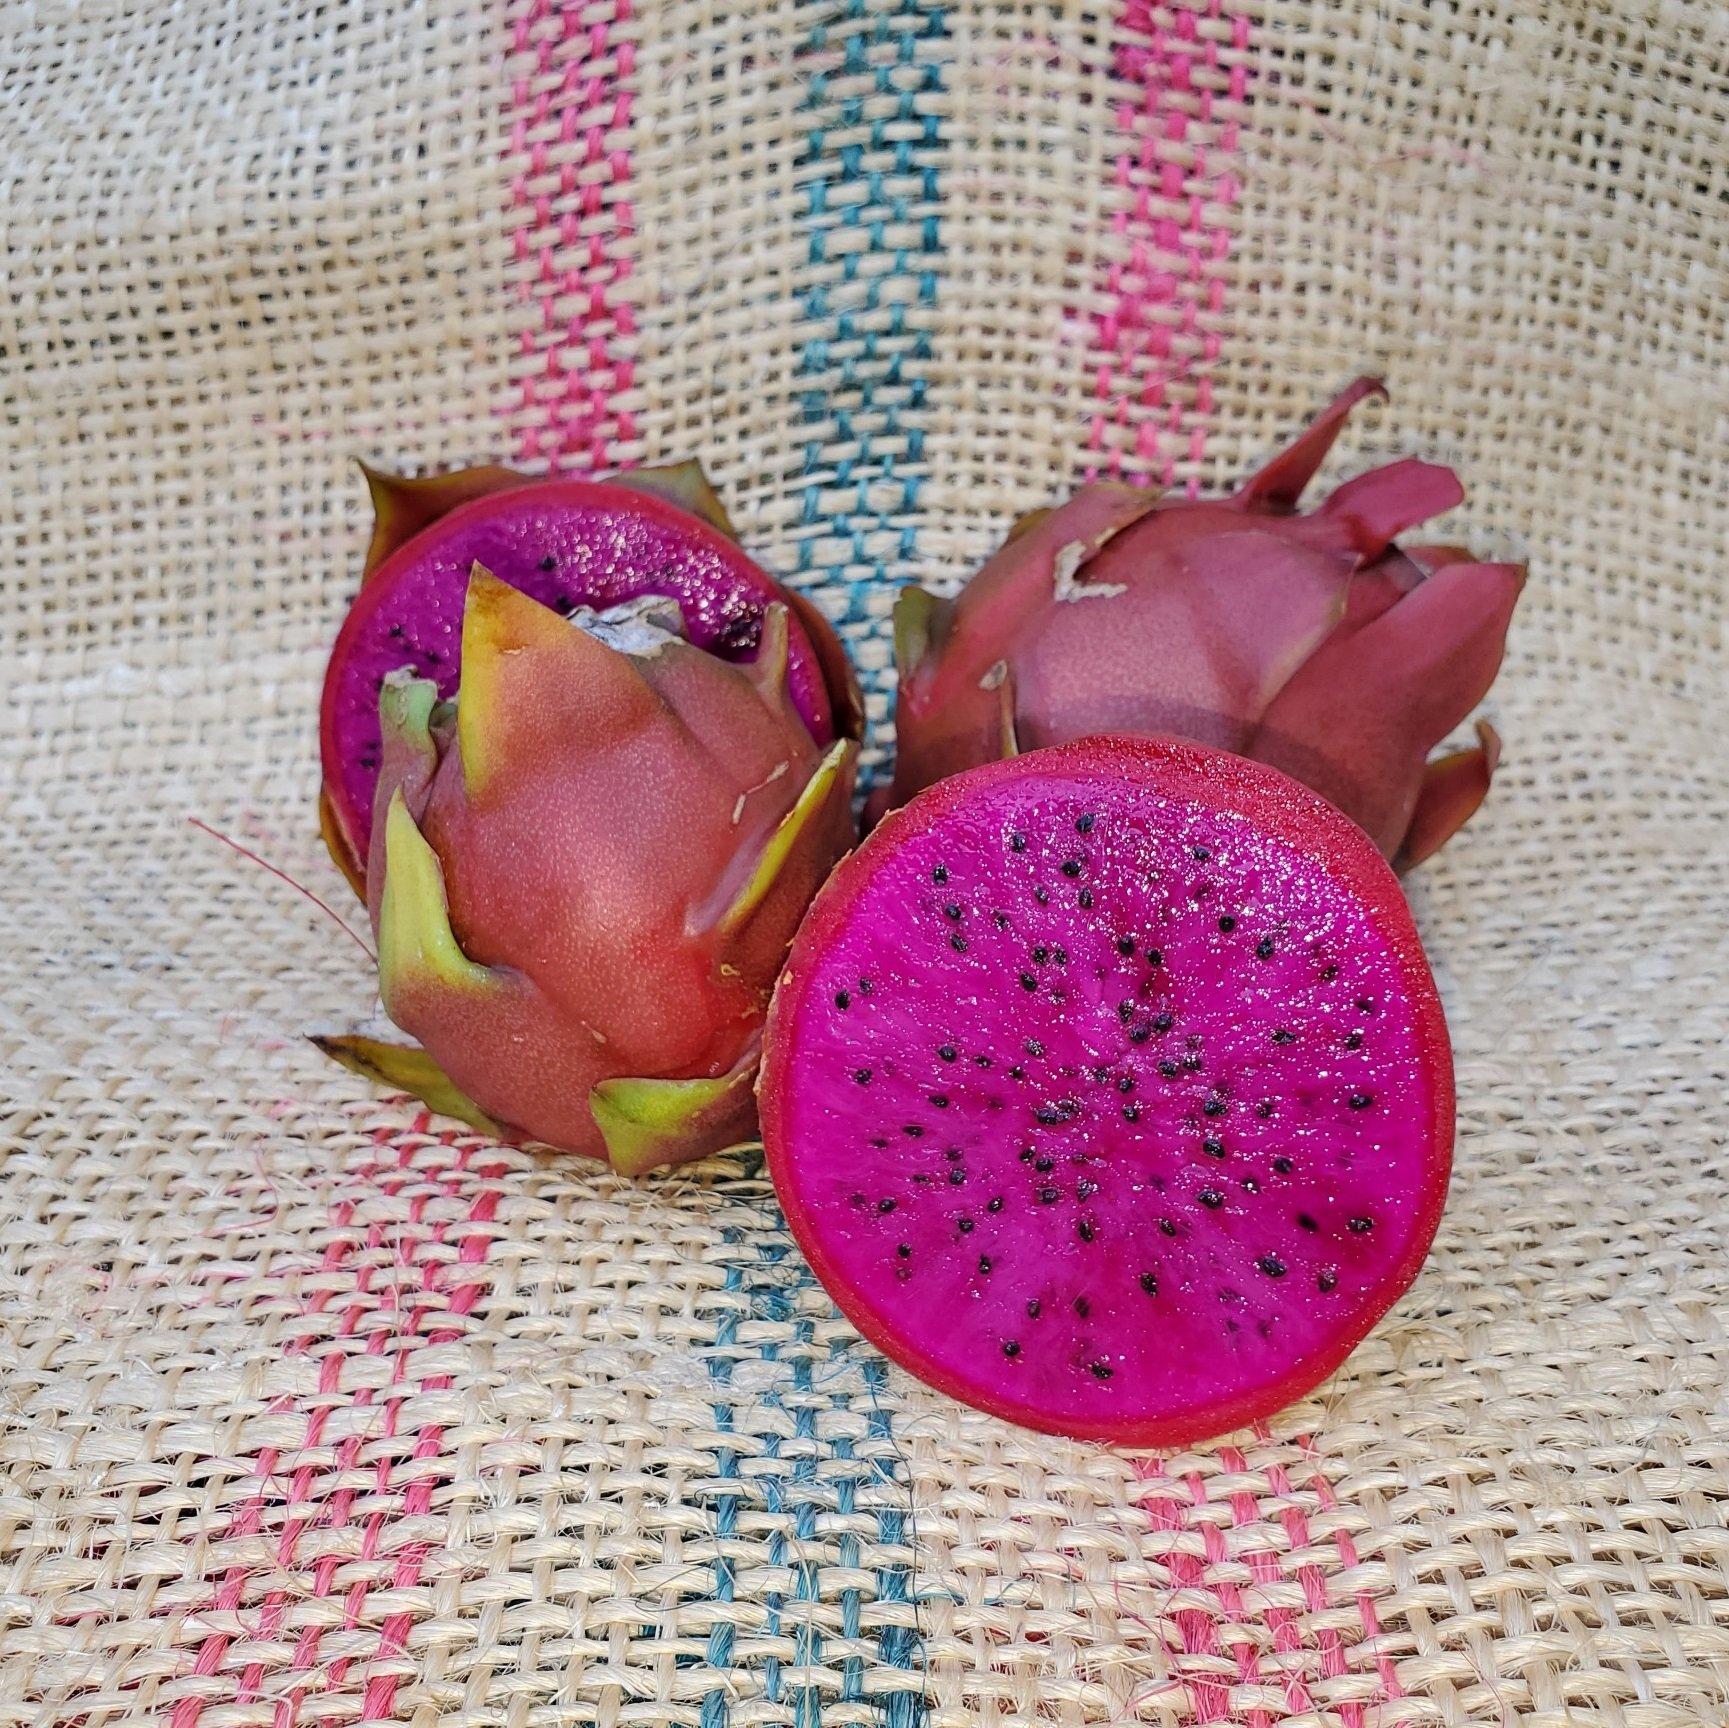 American Beauty fruit Spicy Exotics